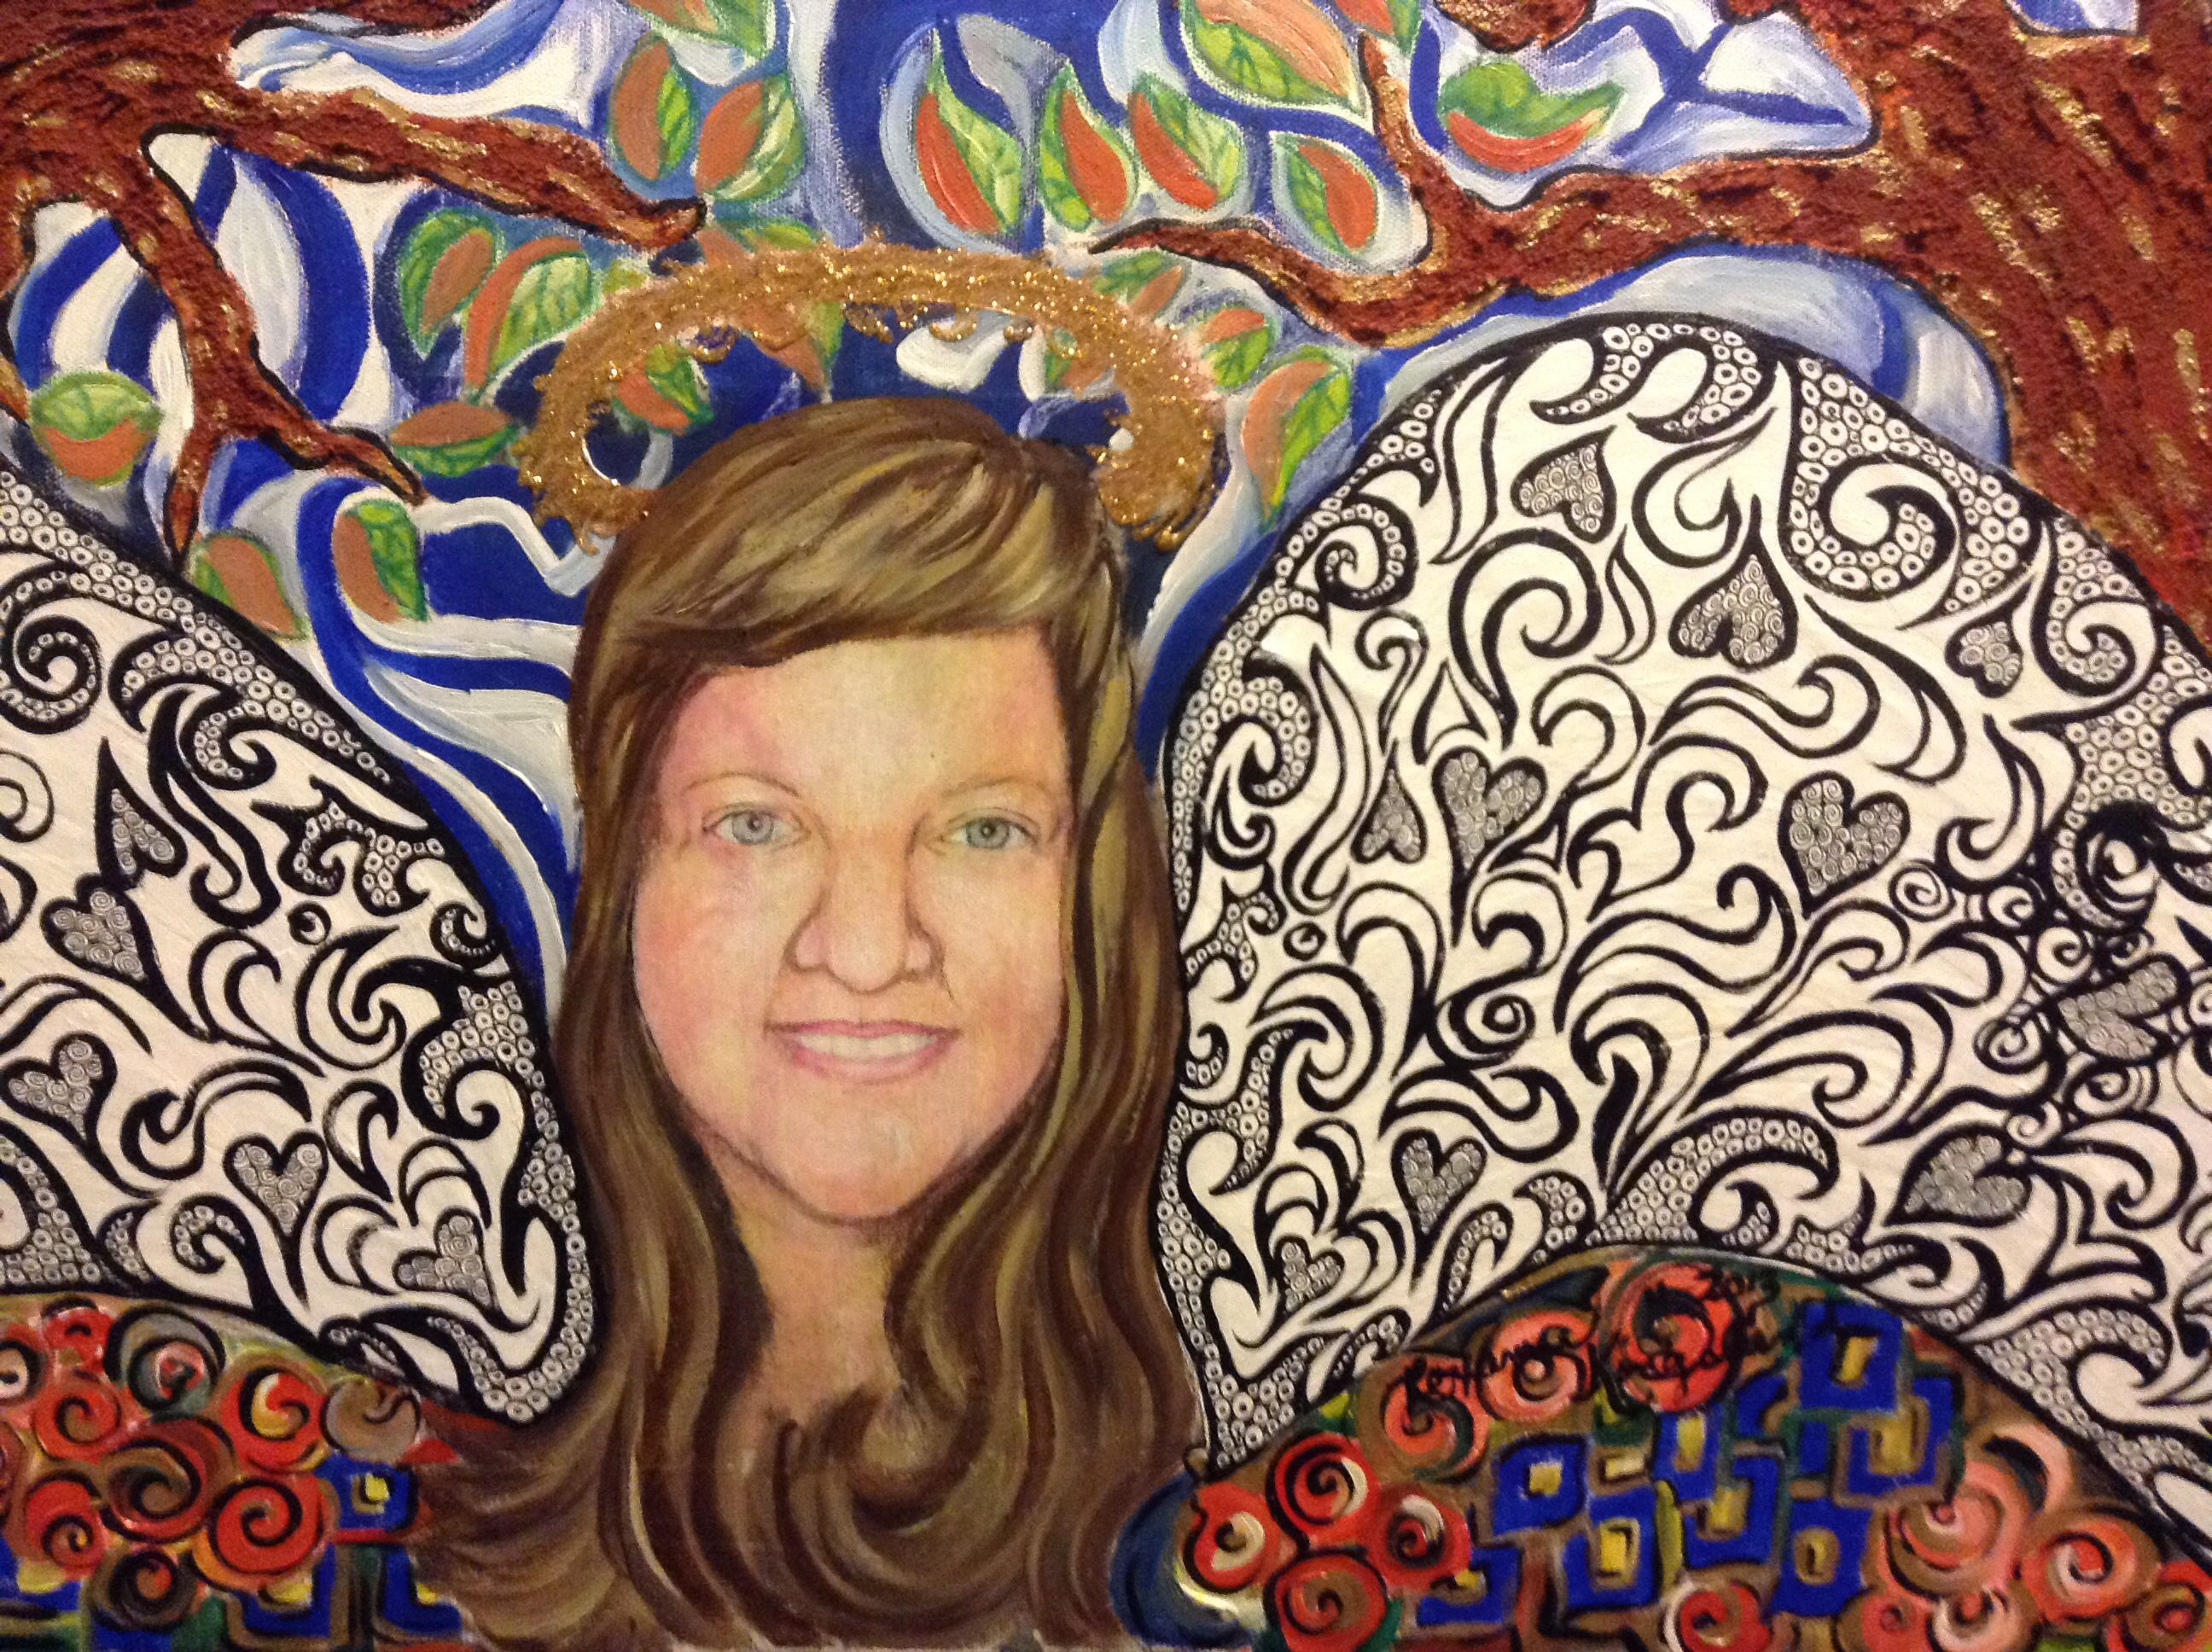 "Mixed media self portrait .  Canvas 16""x20"" acrylics, pen & ink , paper mâché , and t-shirt glitter paint. Fall2013"